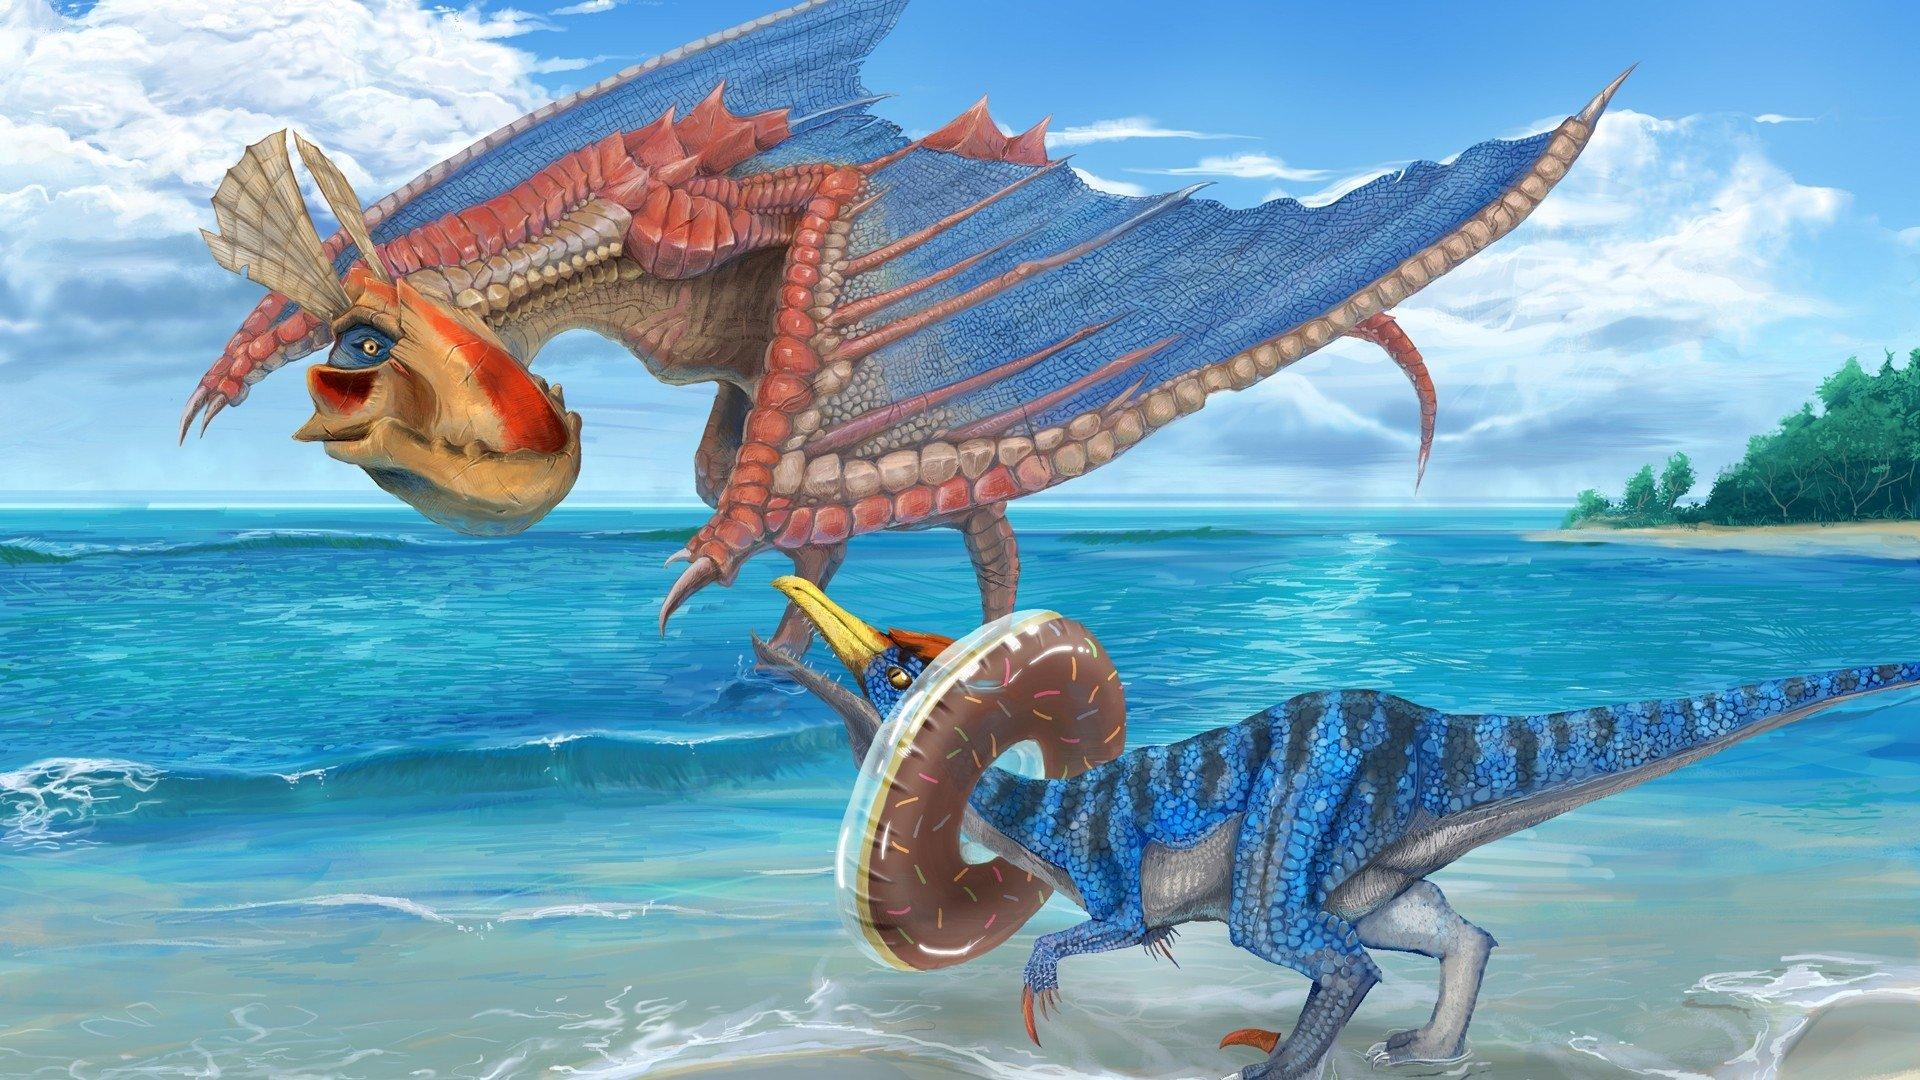 Video Game - Monster Hunter  Creature Ocean Yian Kut-Ku (Monster Hunter) Velocidrome (Monster Hunter) Wallpaper